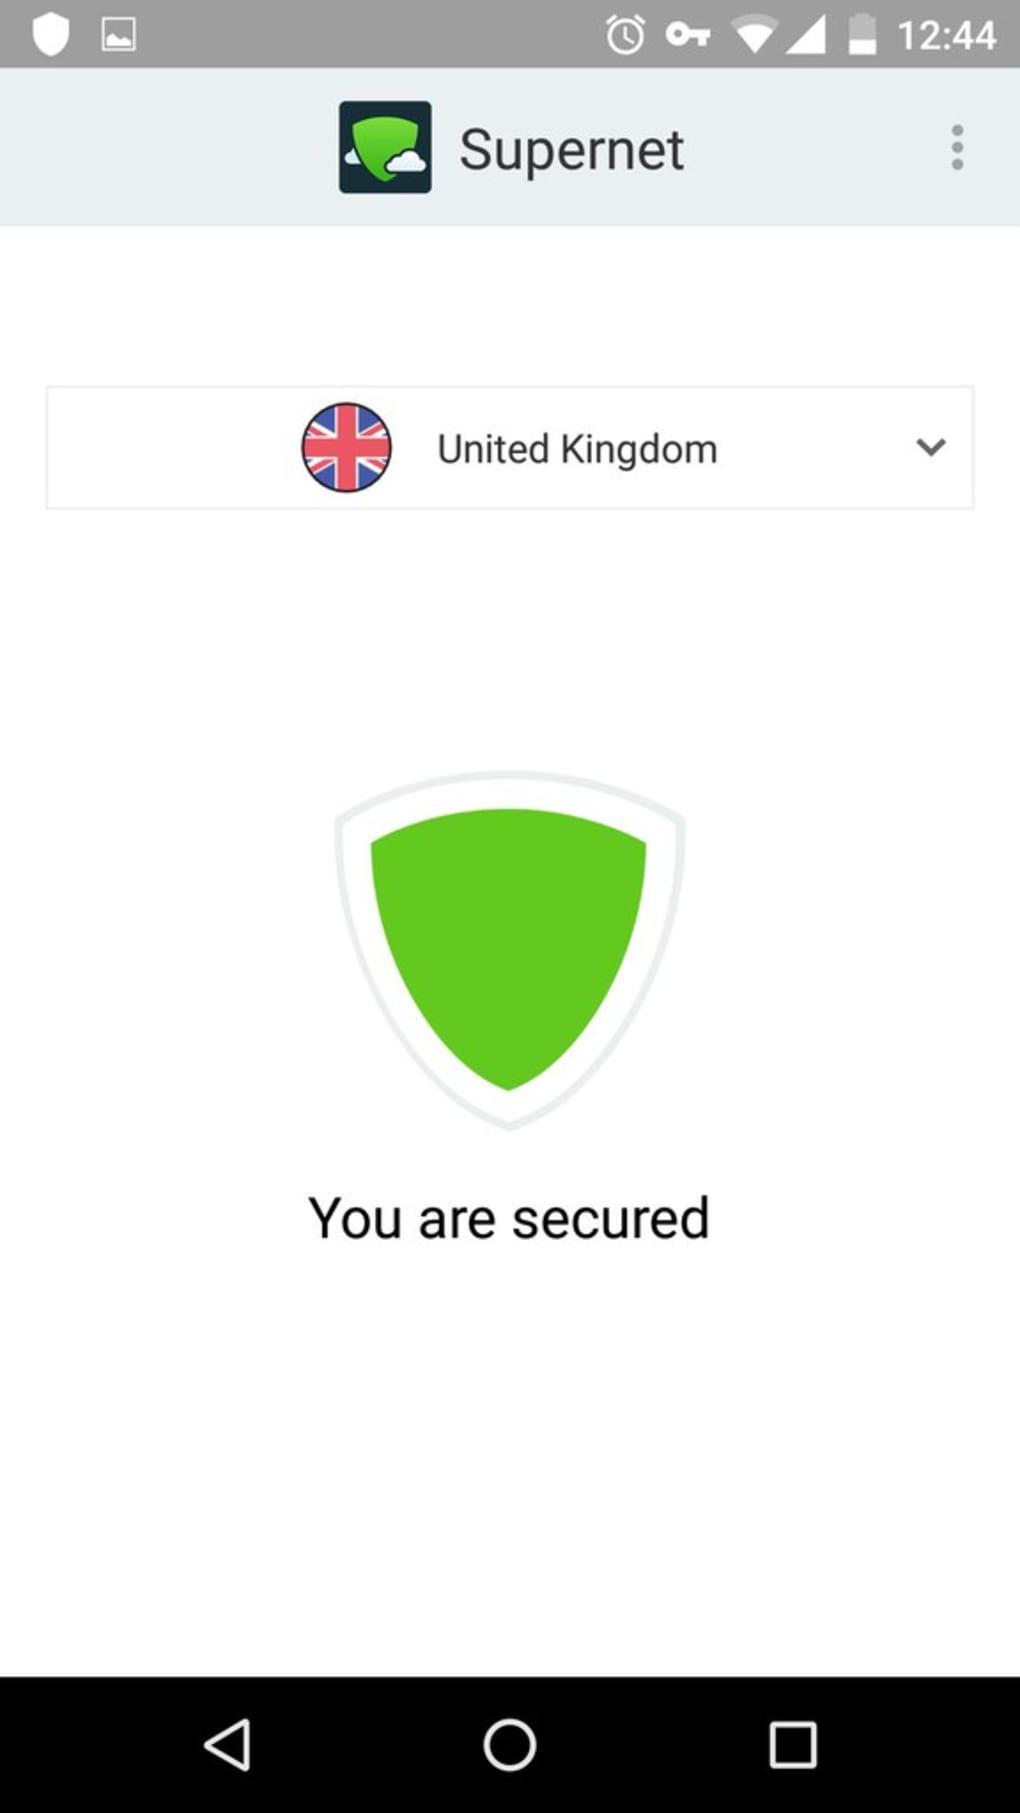 Free VPN Proxy by Supernet 6.6.11 APK